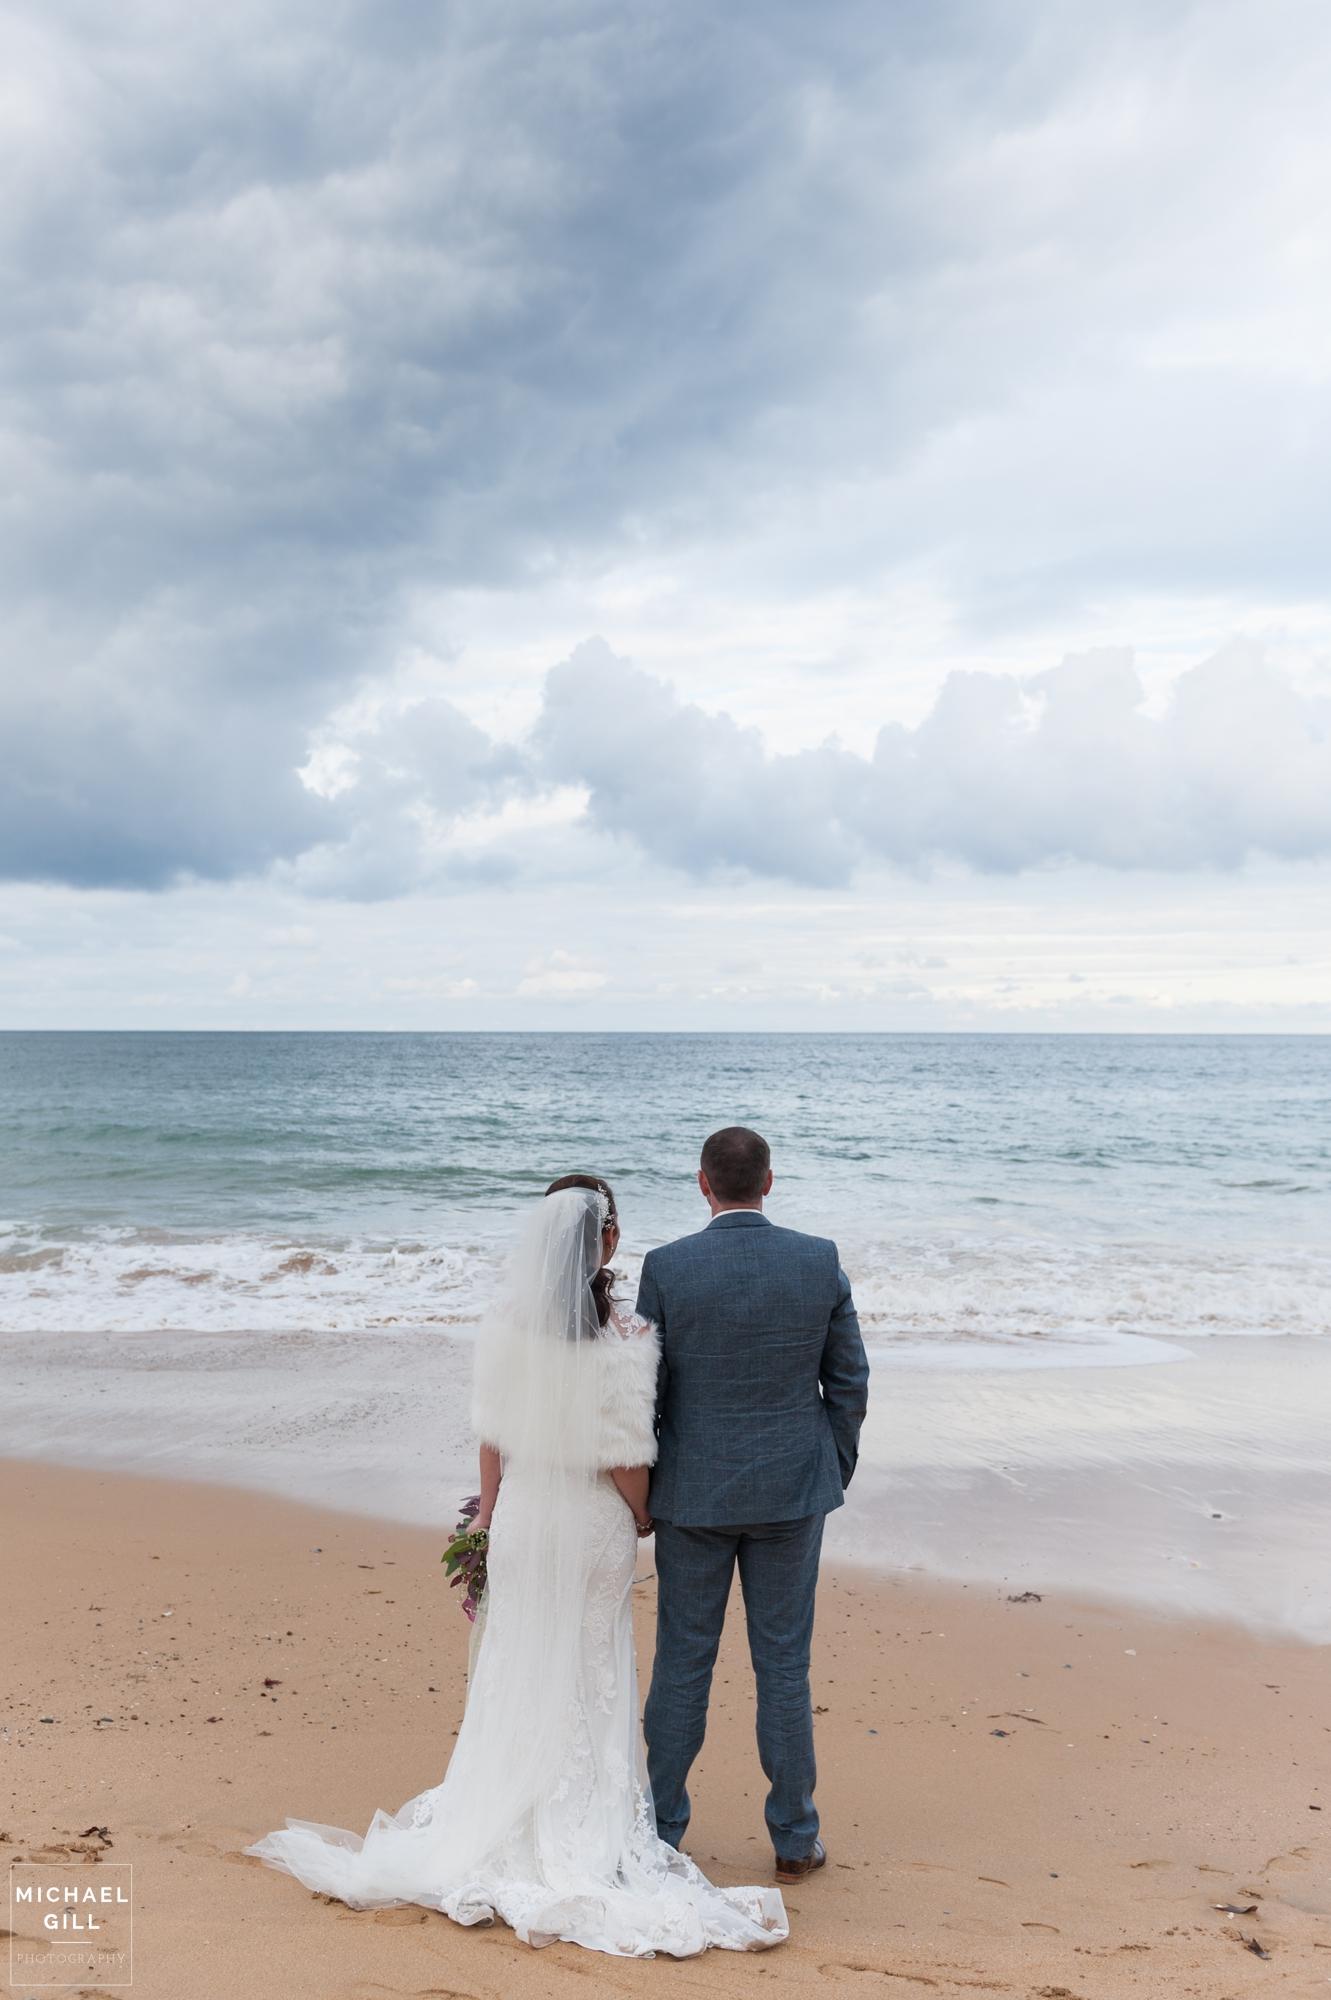 Michael_Gill_Photography_Kinnego_Redcastle_Hotel_Wedding7.jpg